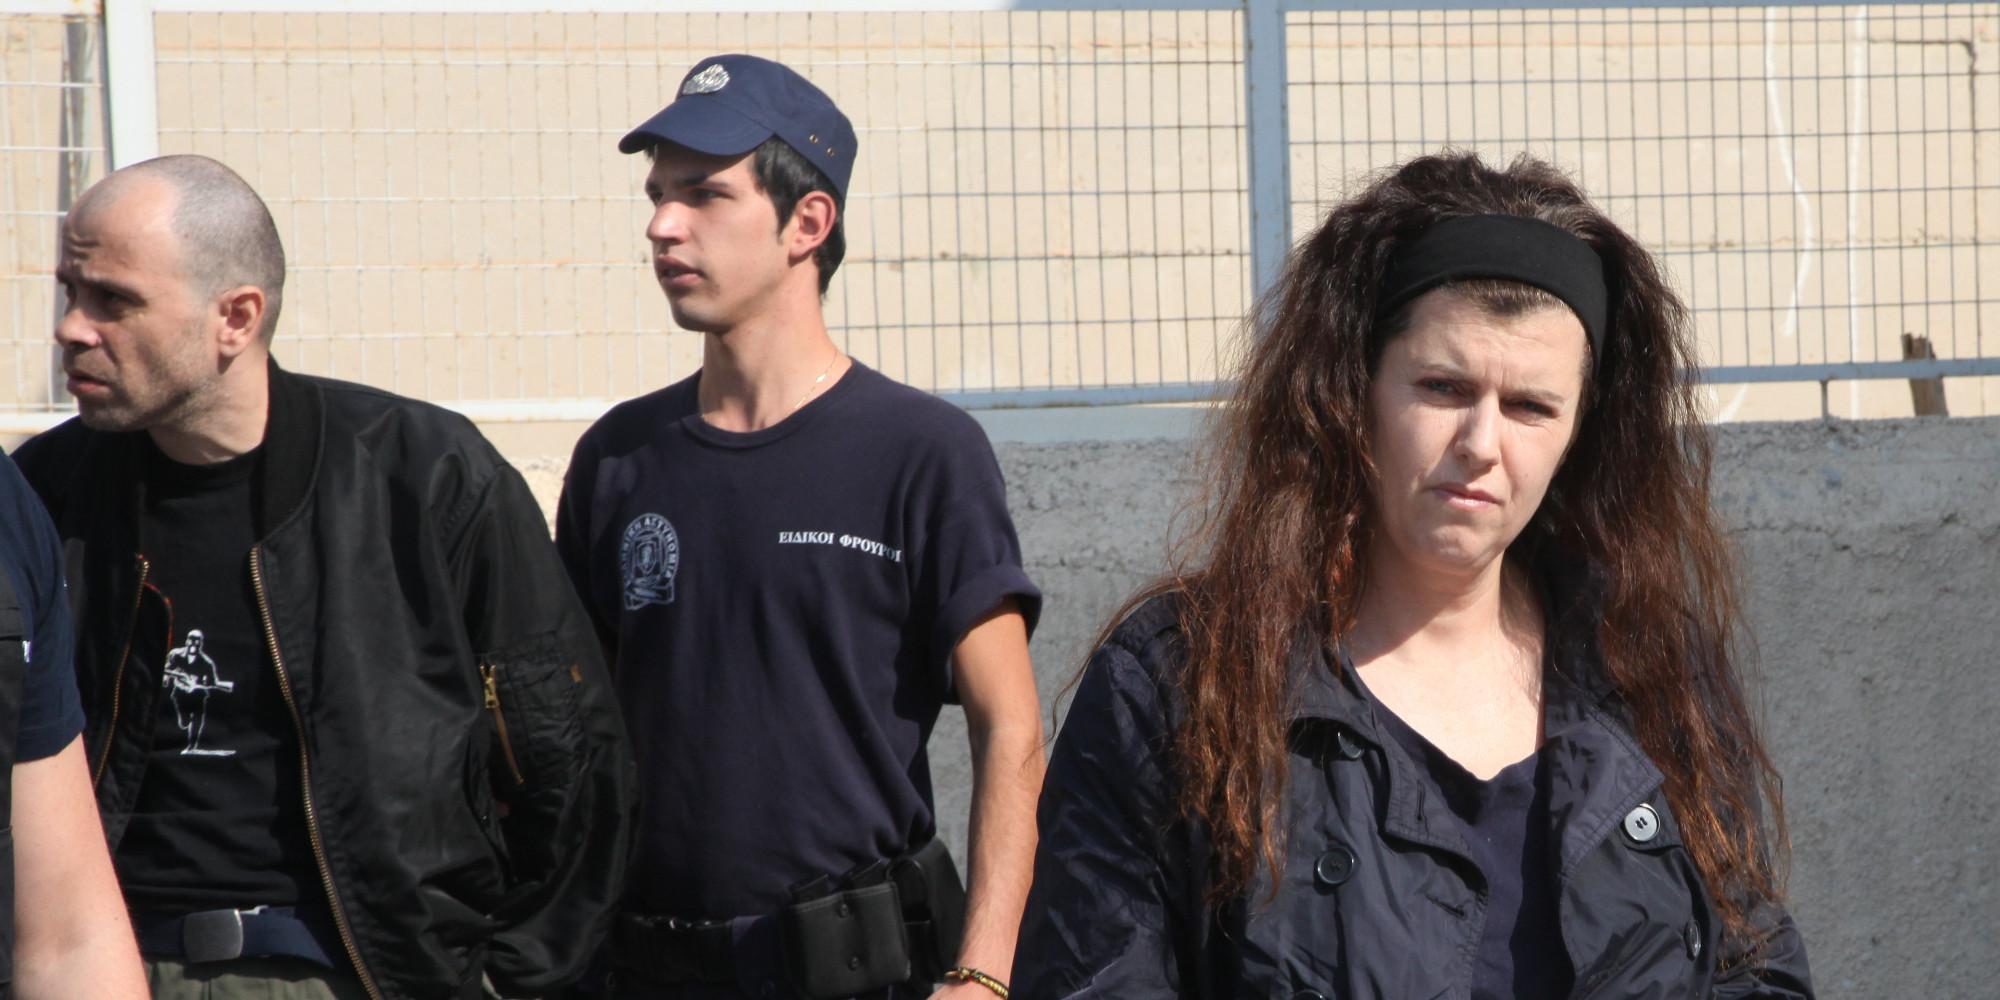 polla-roupa-1000 Συνελήφθη στην Αθήνα η καταζητούμενη τρομοκράτης Πόλα Ρούπα